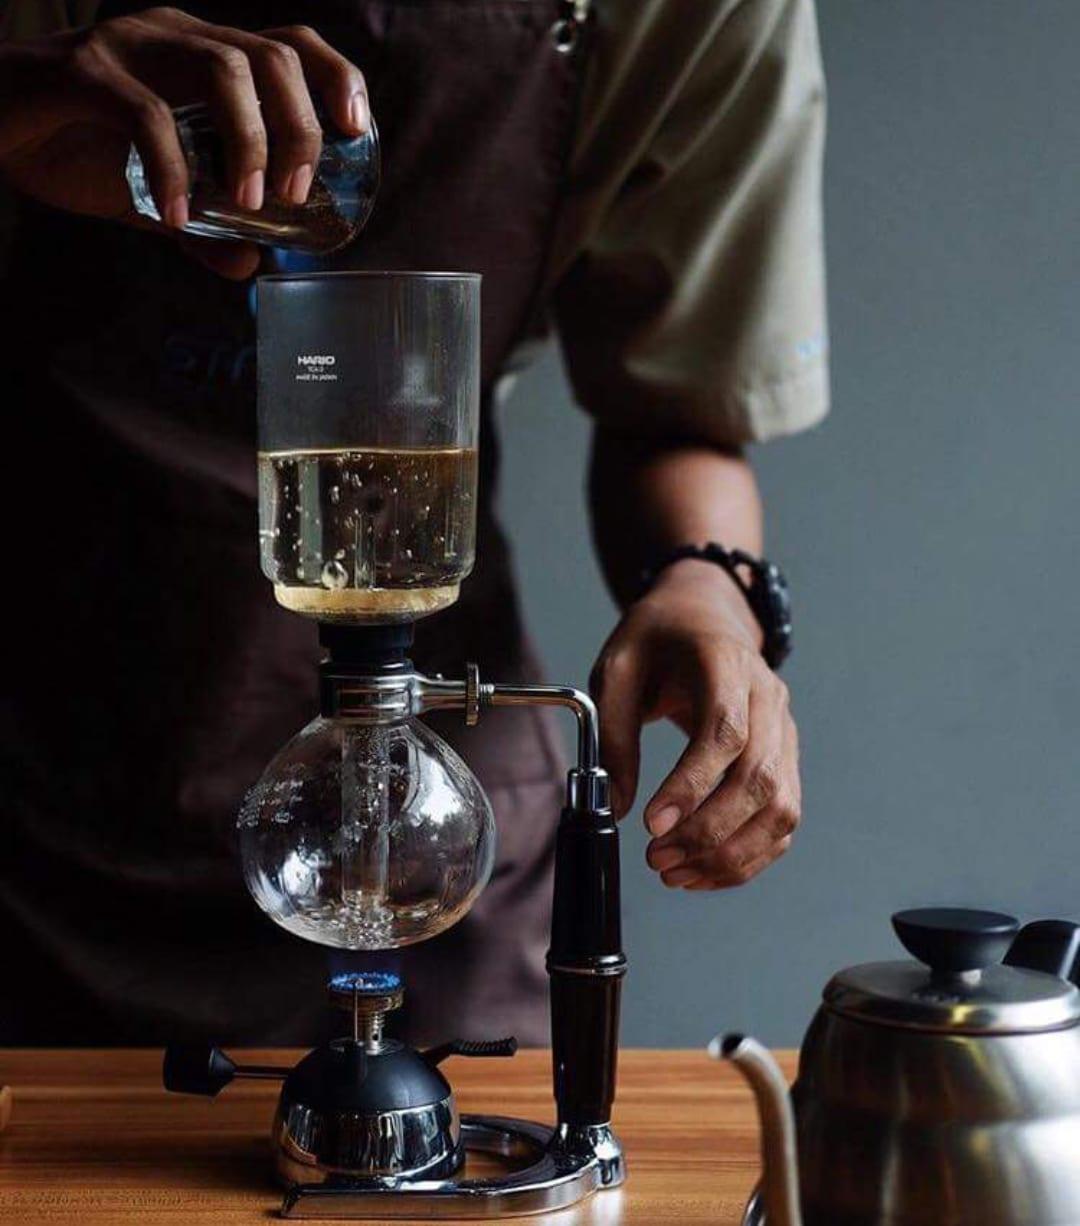 Barista using a coffee syphon